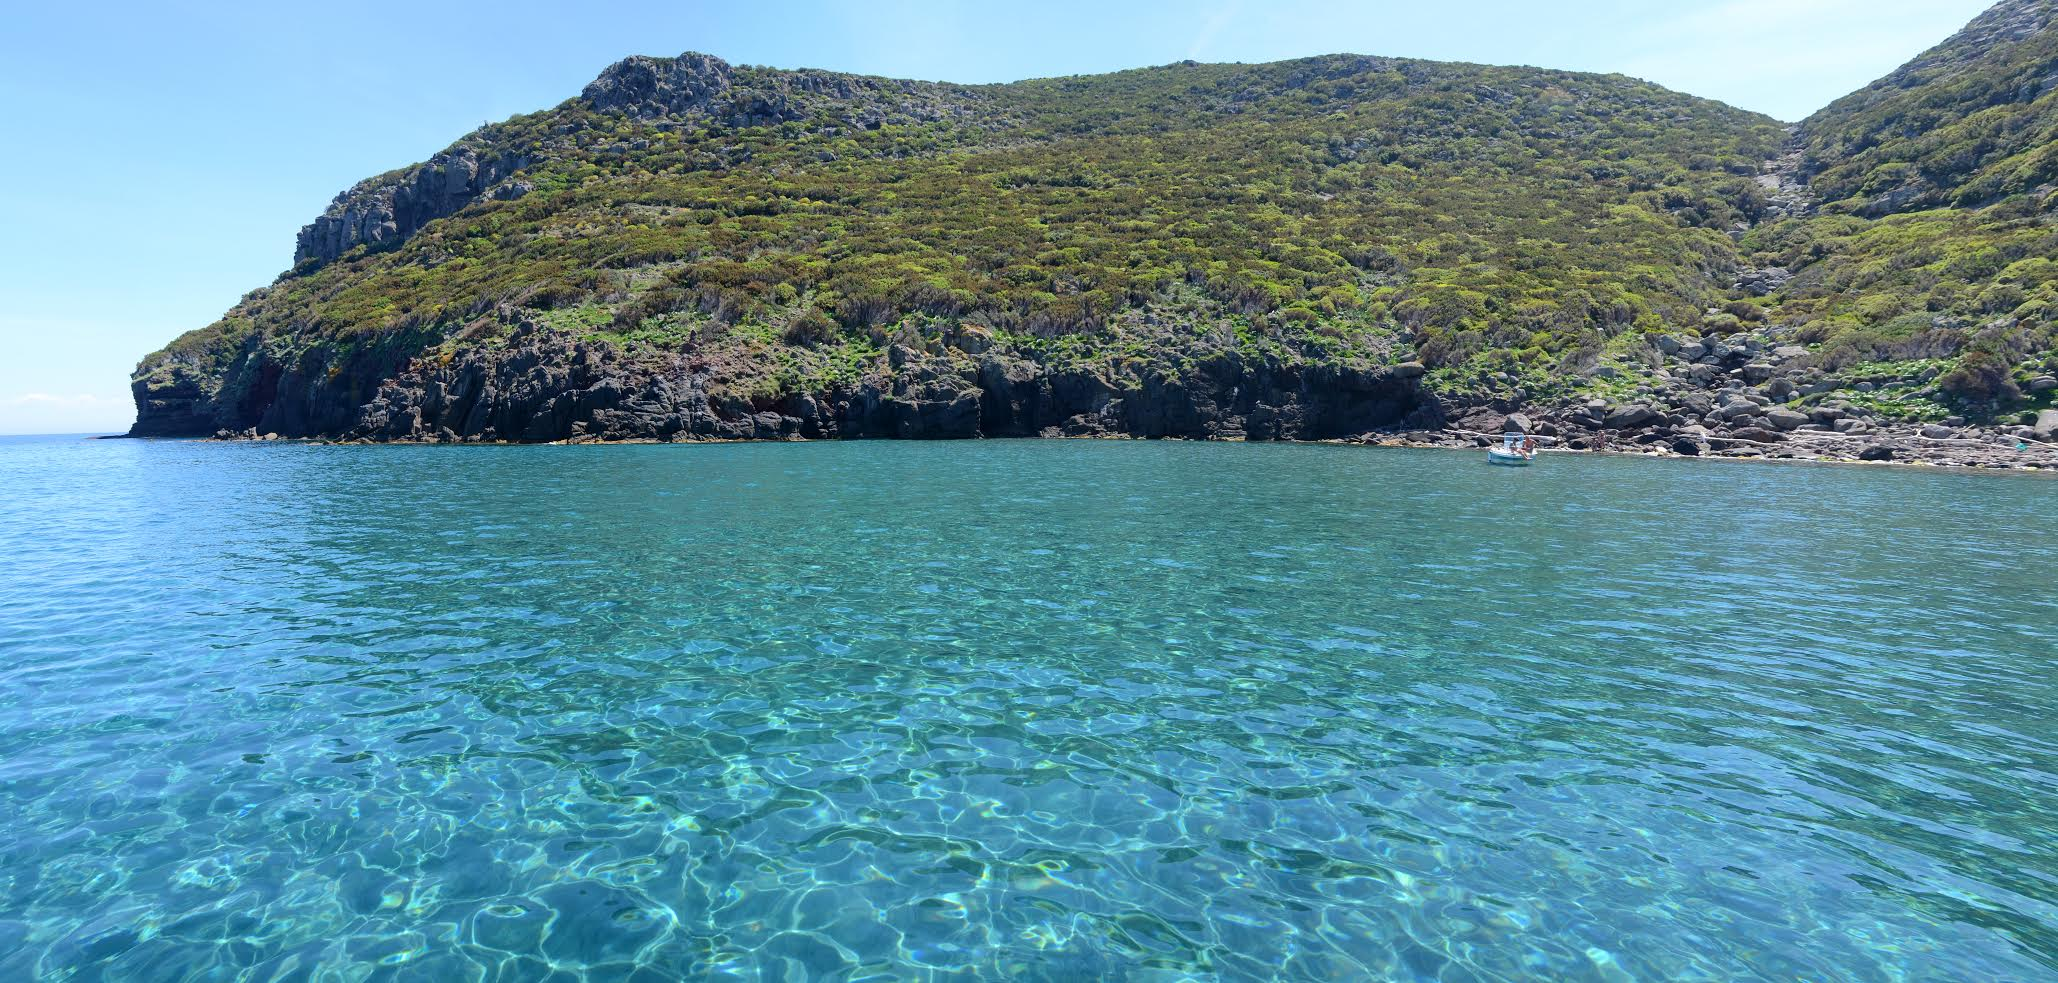 Capraia Isola - Capraia in canto - Toscana Ovunque Bella